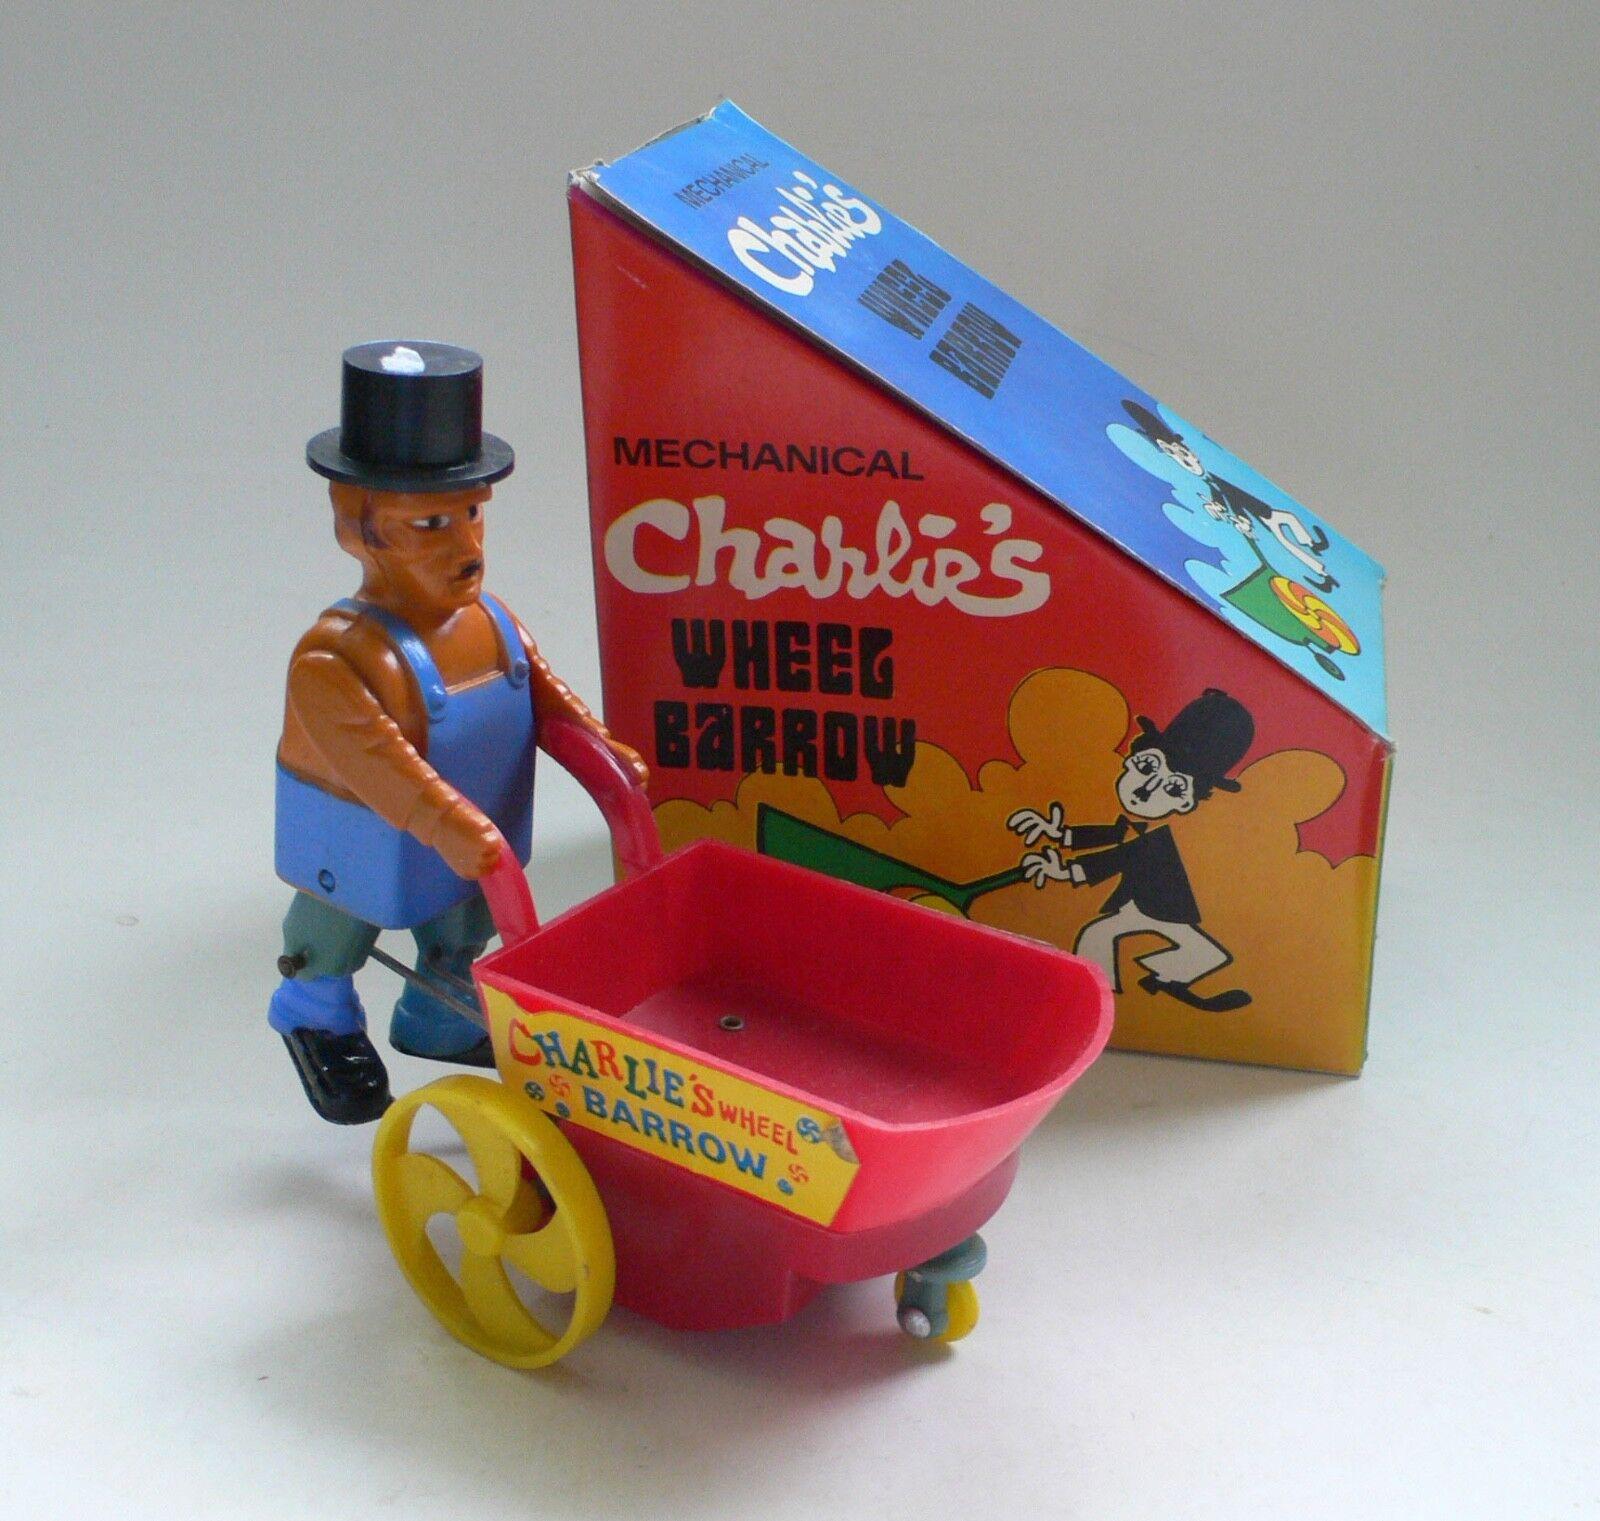 Vintage Mechanical CHARLIE'S WHEEL BARROW Charlie Chaplin Toy MIB 1960's